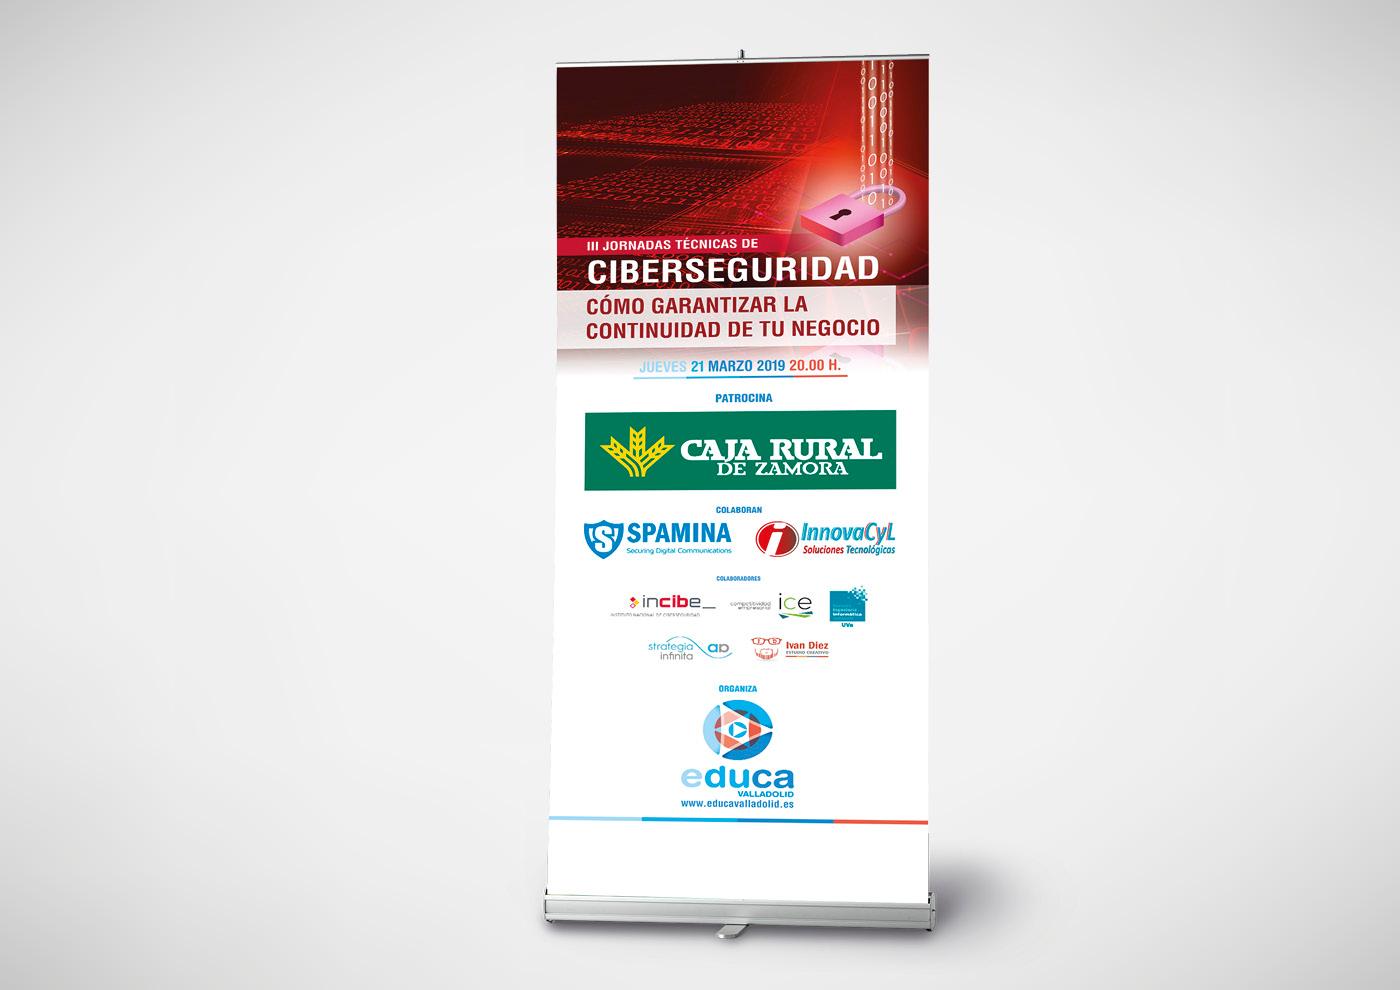 Educa - Jornada Profesional Ciberseguridad - Expositor enrrollable - Ivan Diez